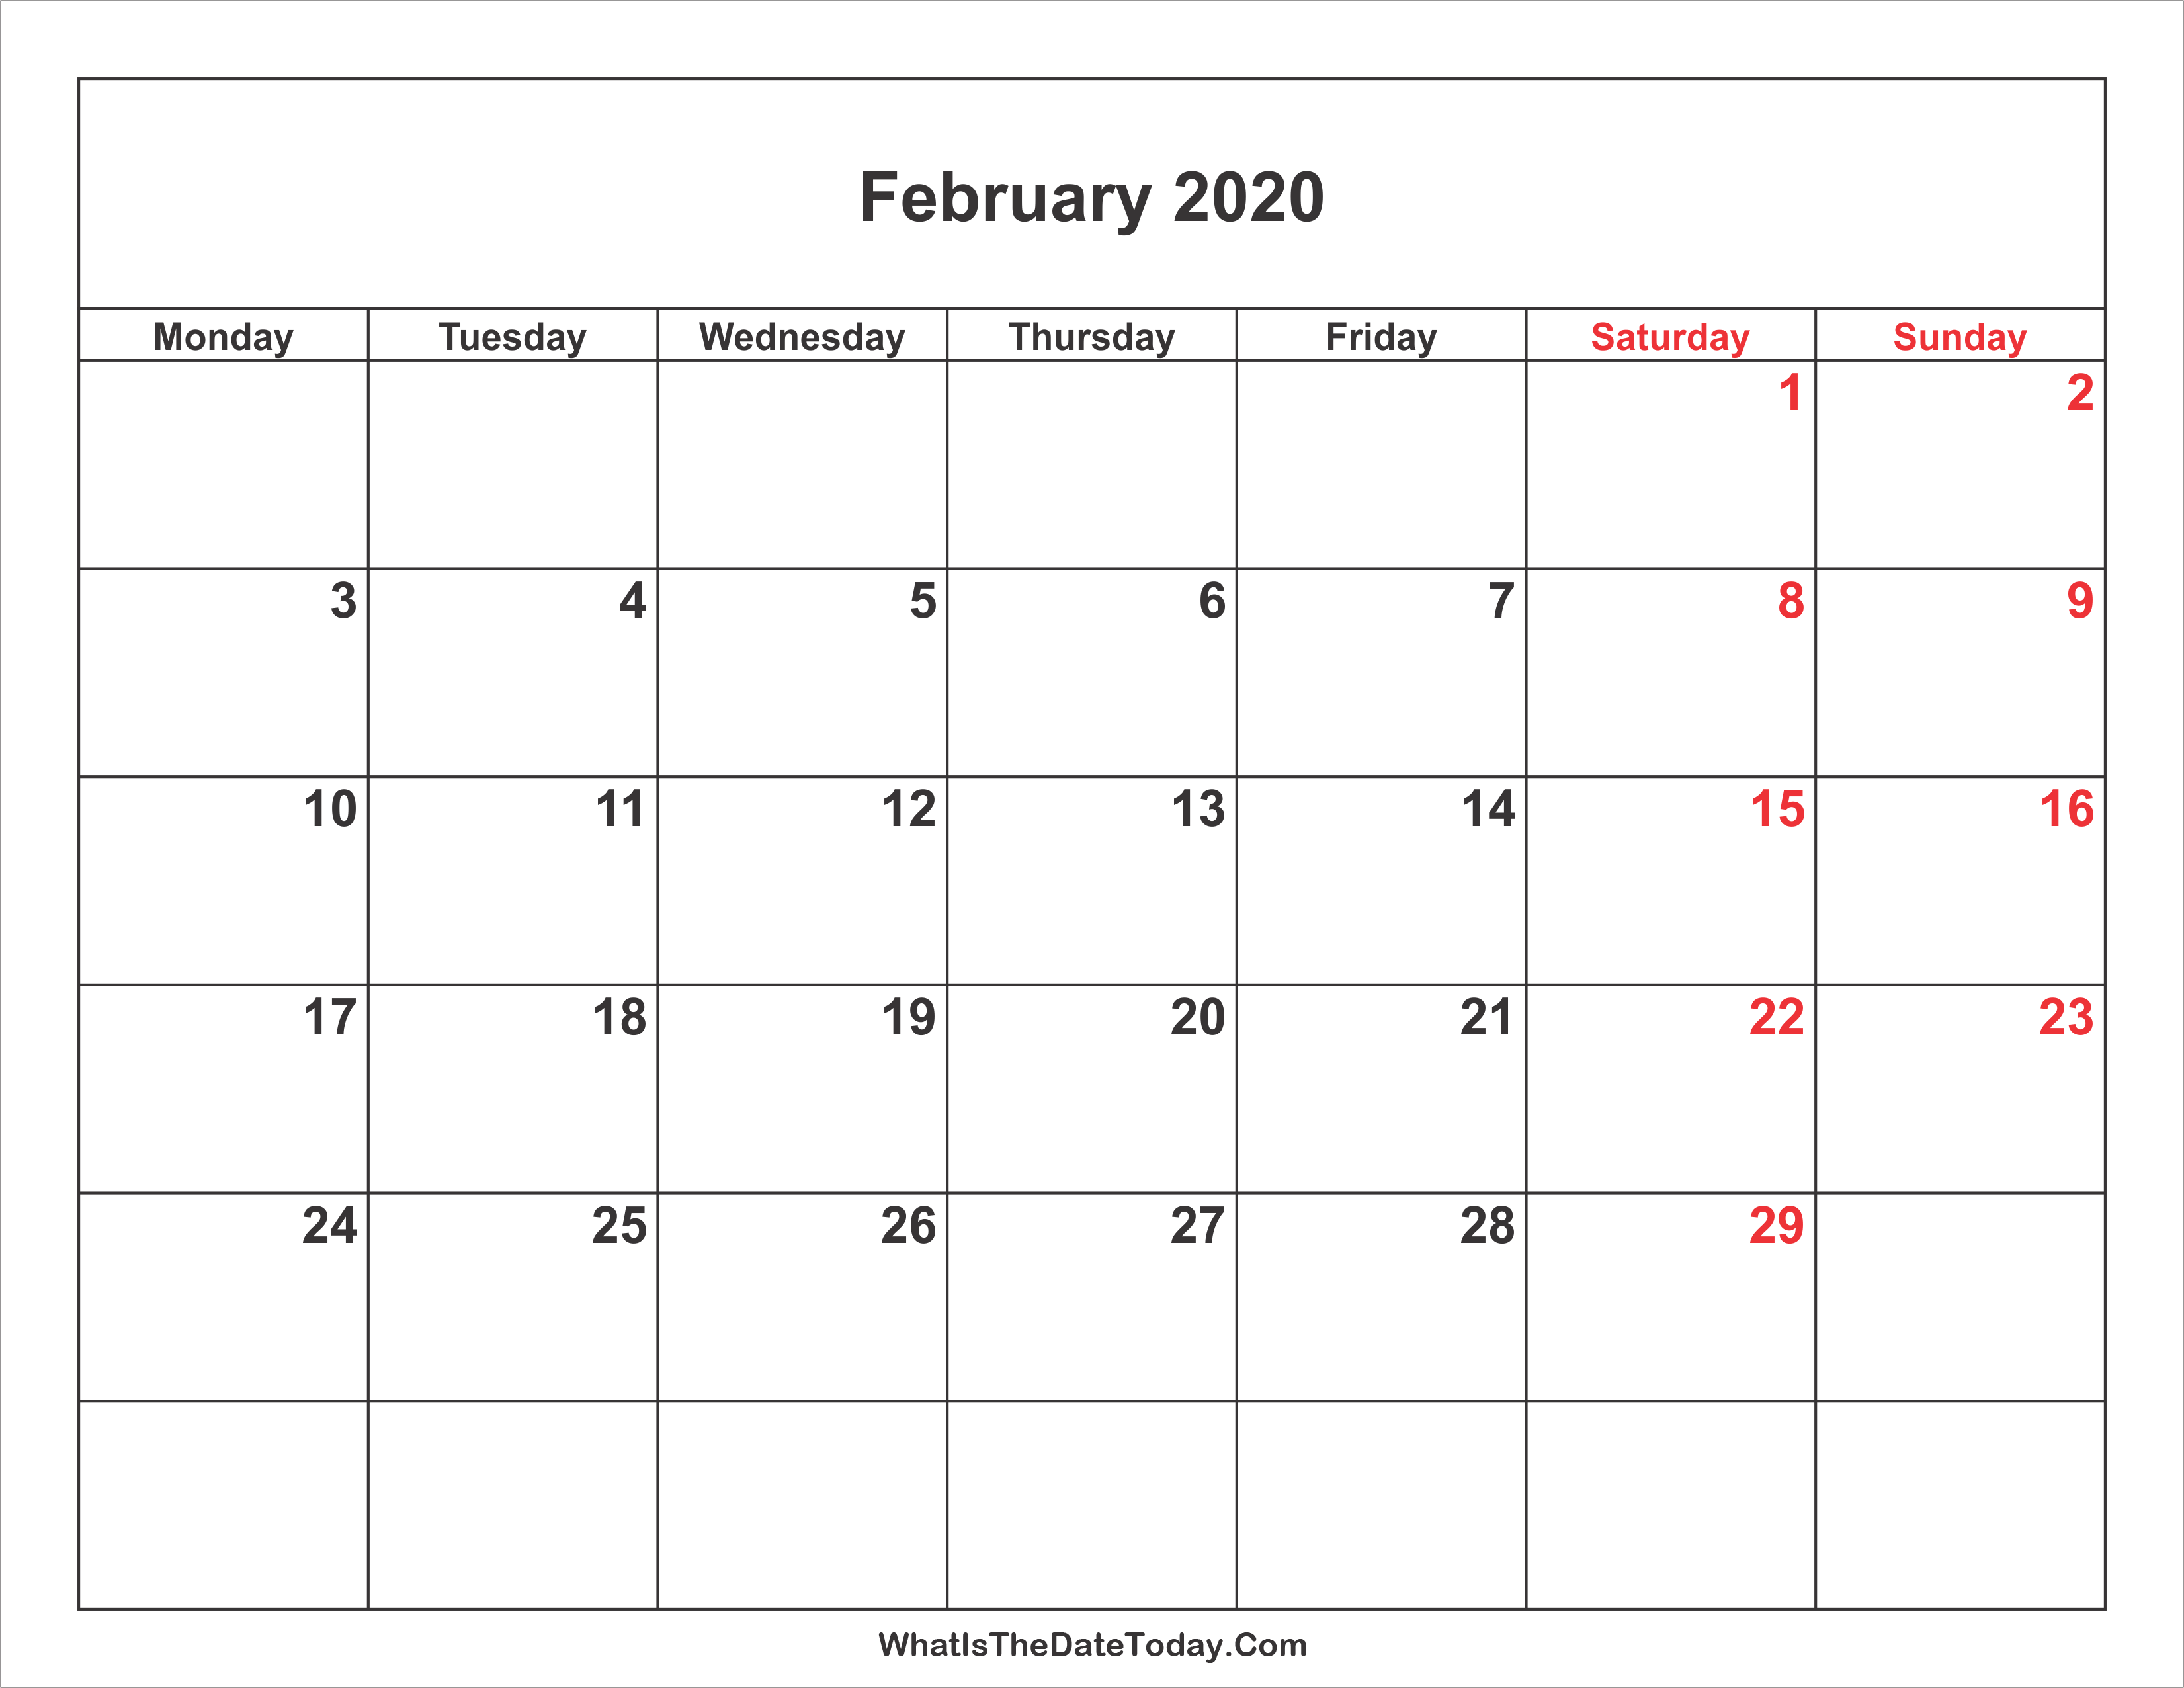 Weekend Calendar 2020 February 2020 Calendar with Weekend Highlight | Whatisthedatetoday.Com